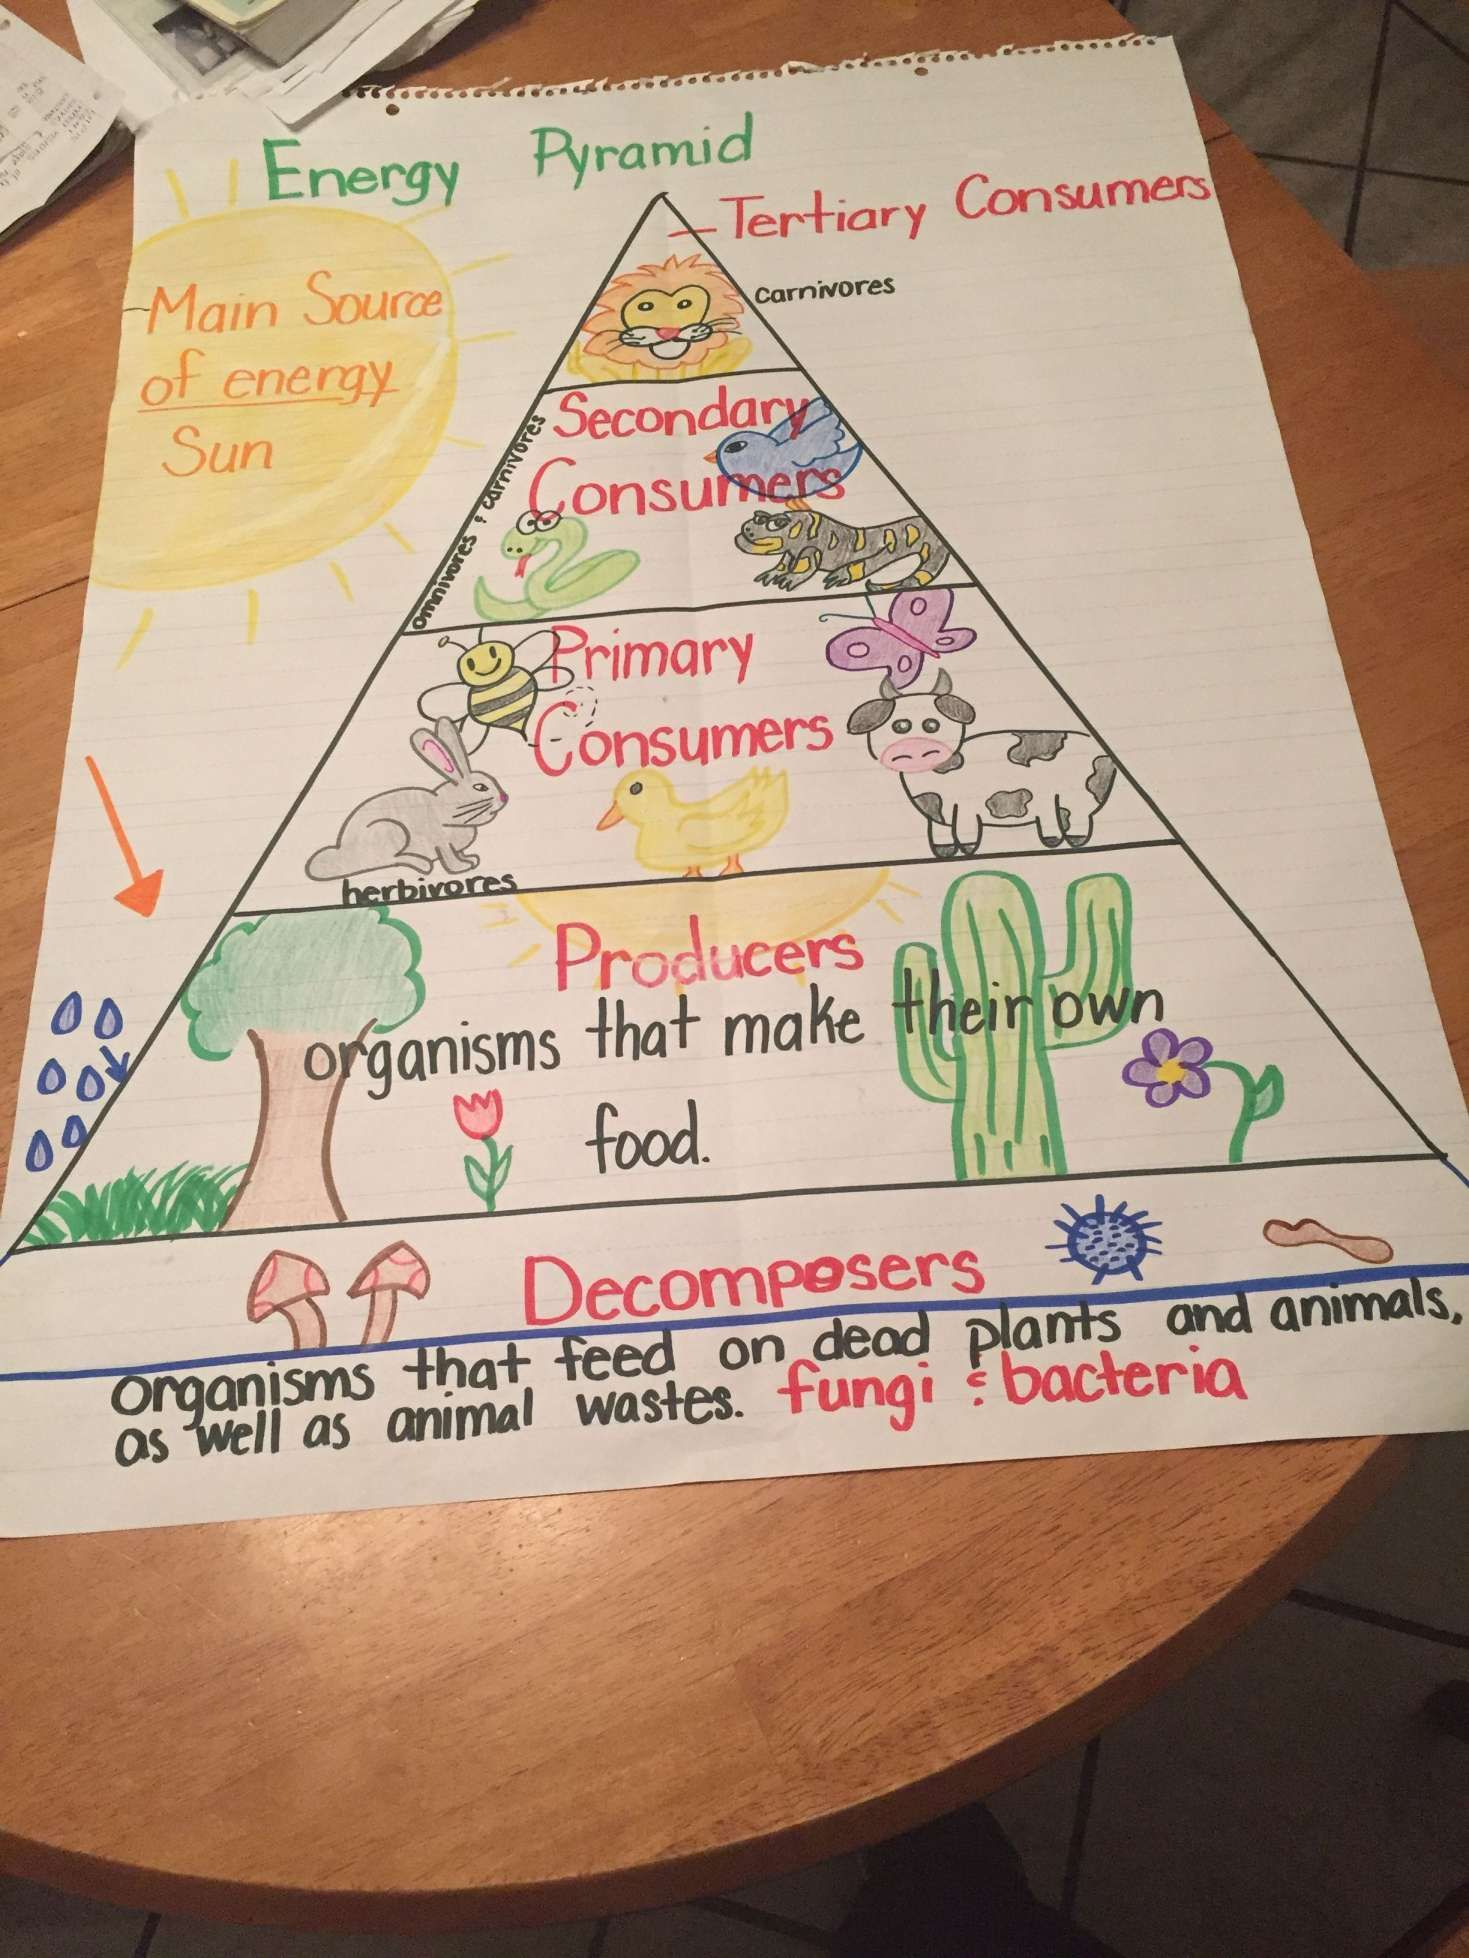 15 Energy Pyramid Worksheet 4th Grade In